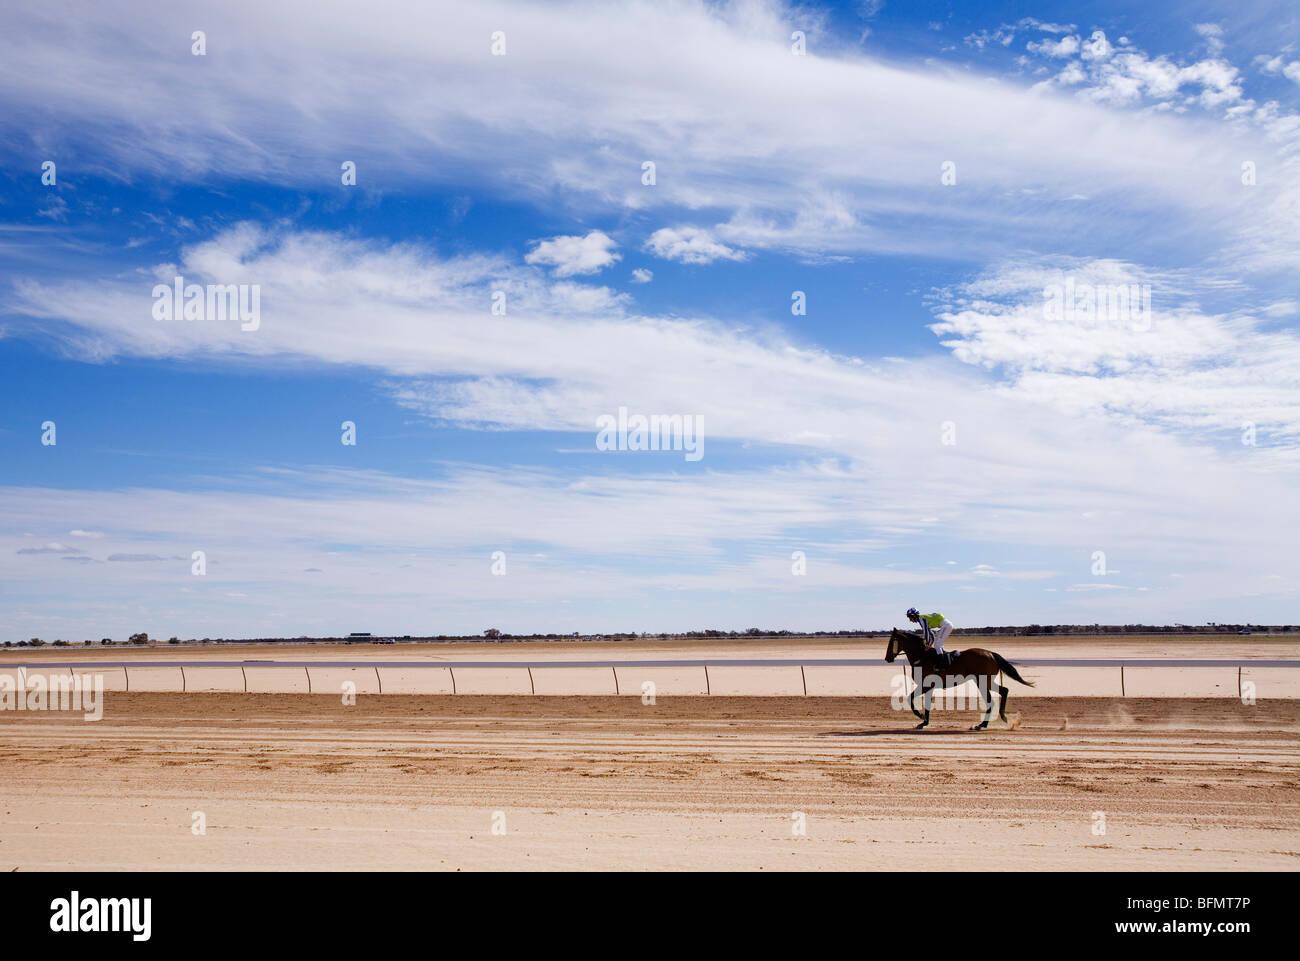 Australia, Queensland, Birdsville.  A horse rider on the dirt track at Birdsville during the annual Birdsville Cup - Stock Image